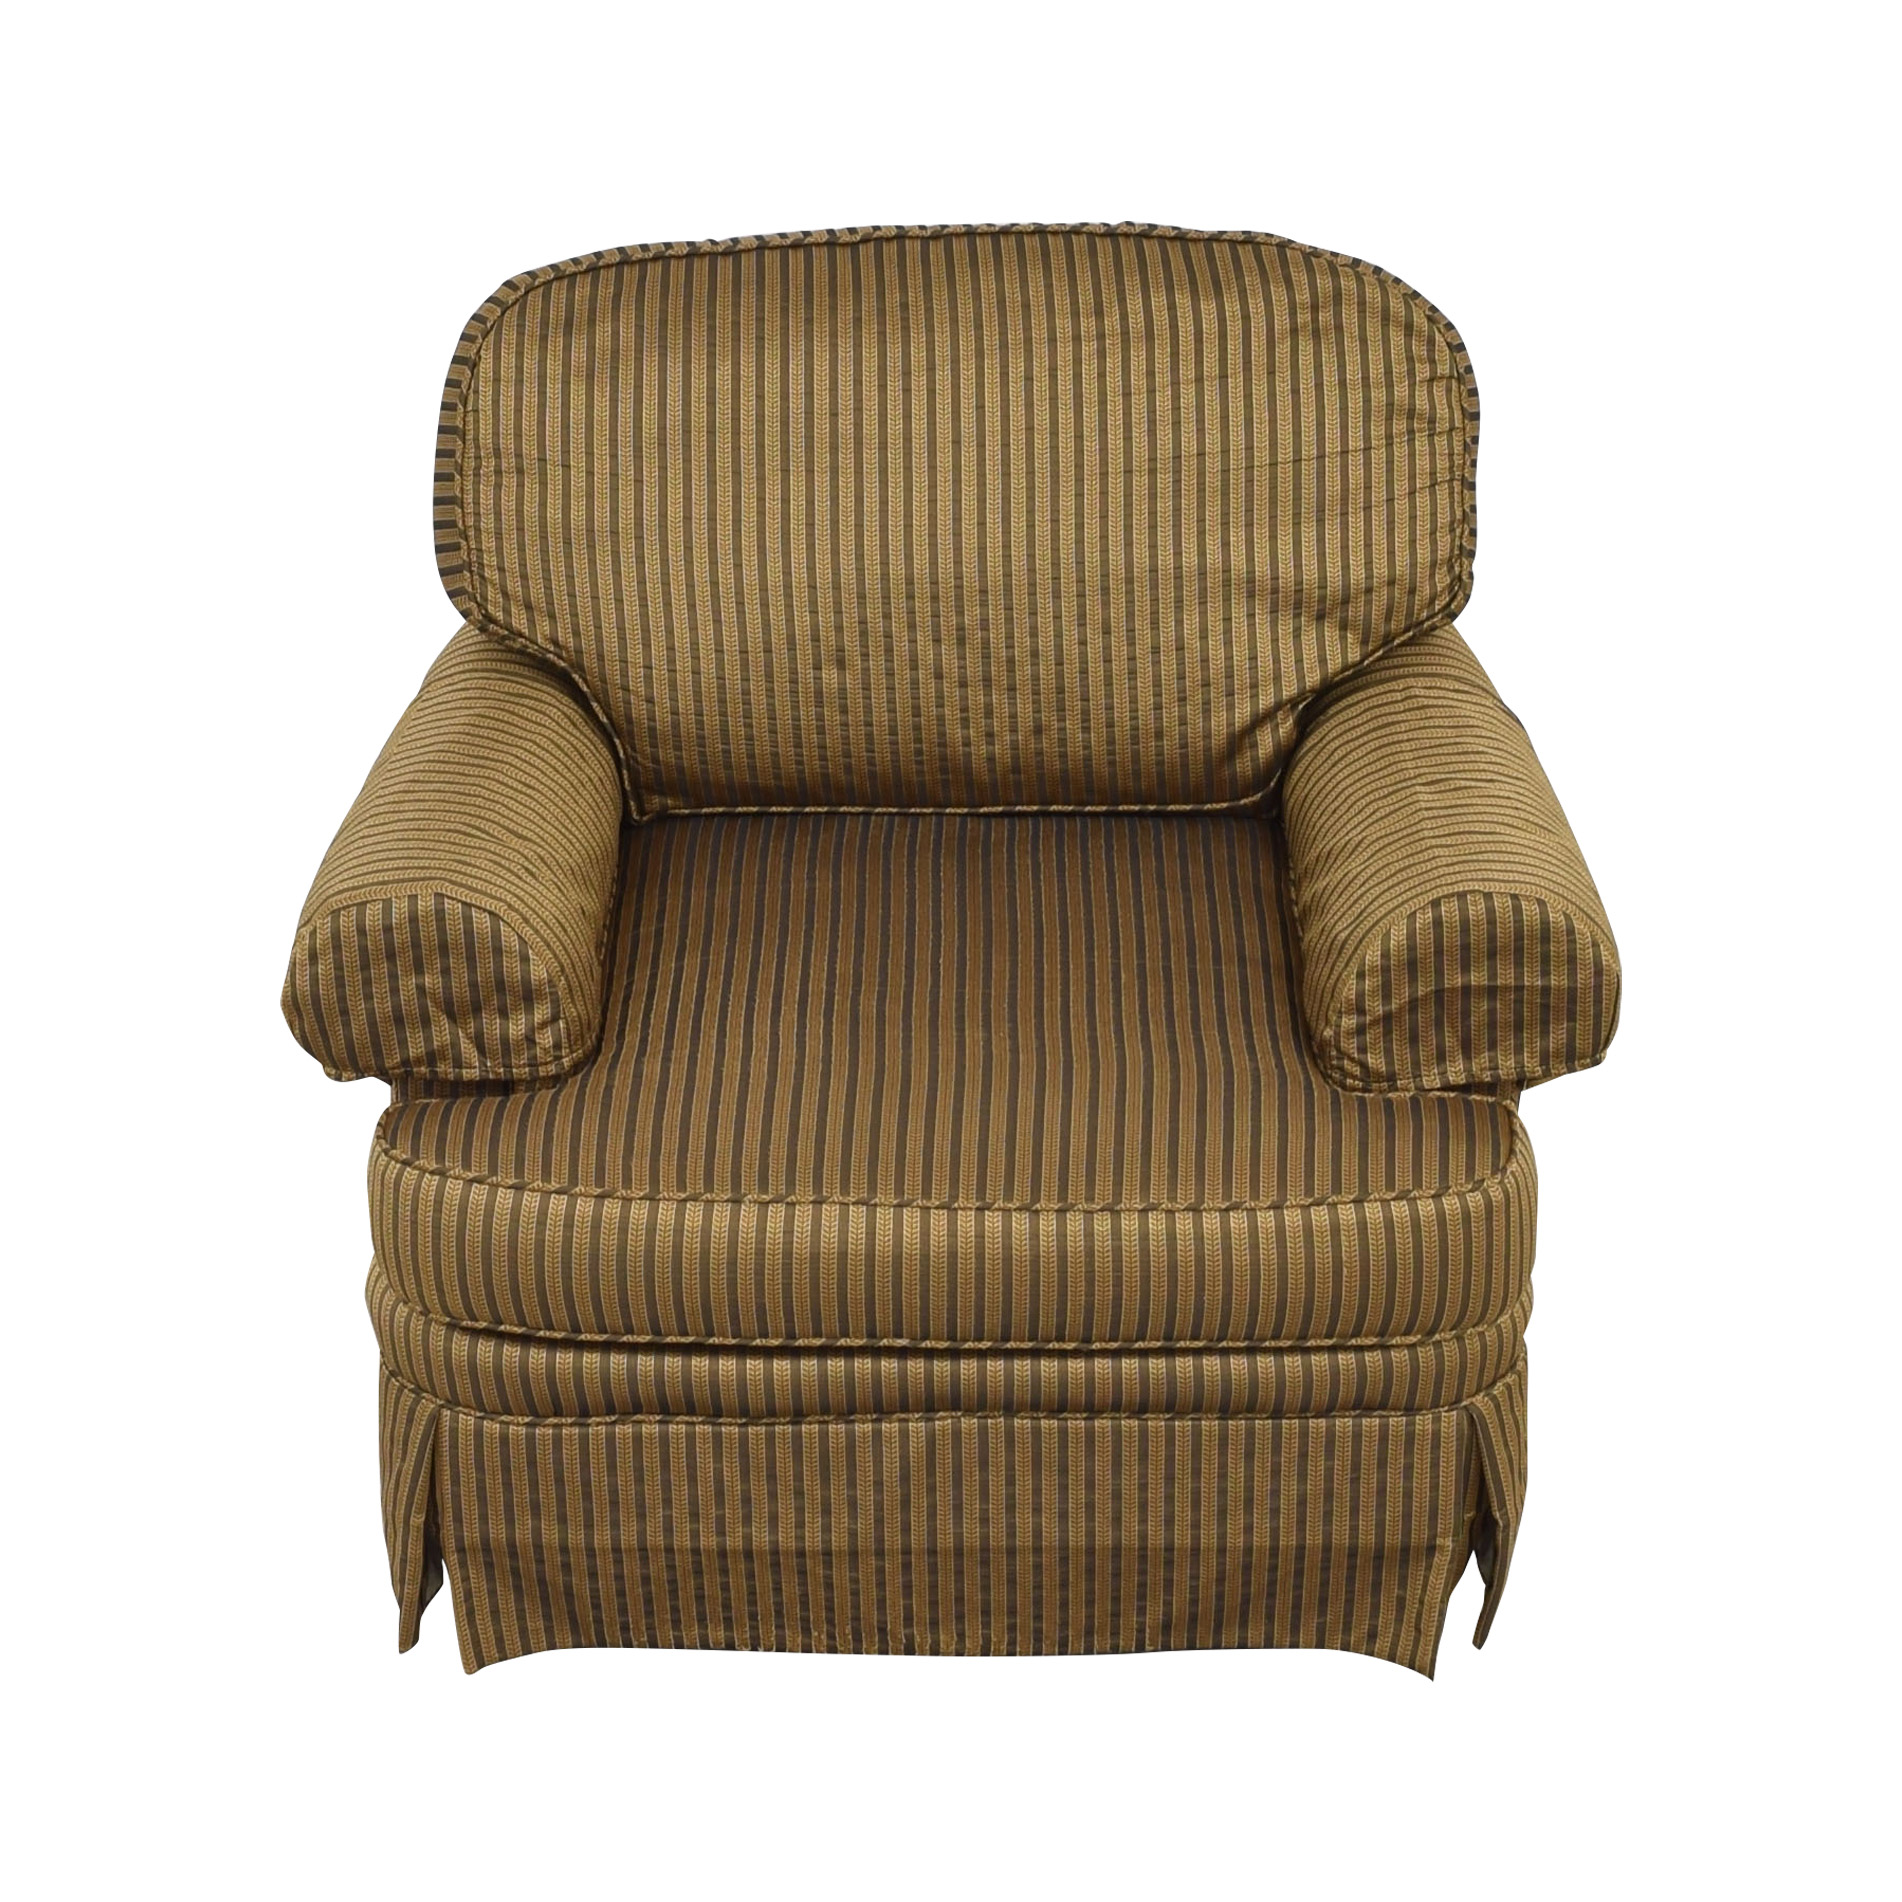 Woodmark Woodmark Swivel Chair used